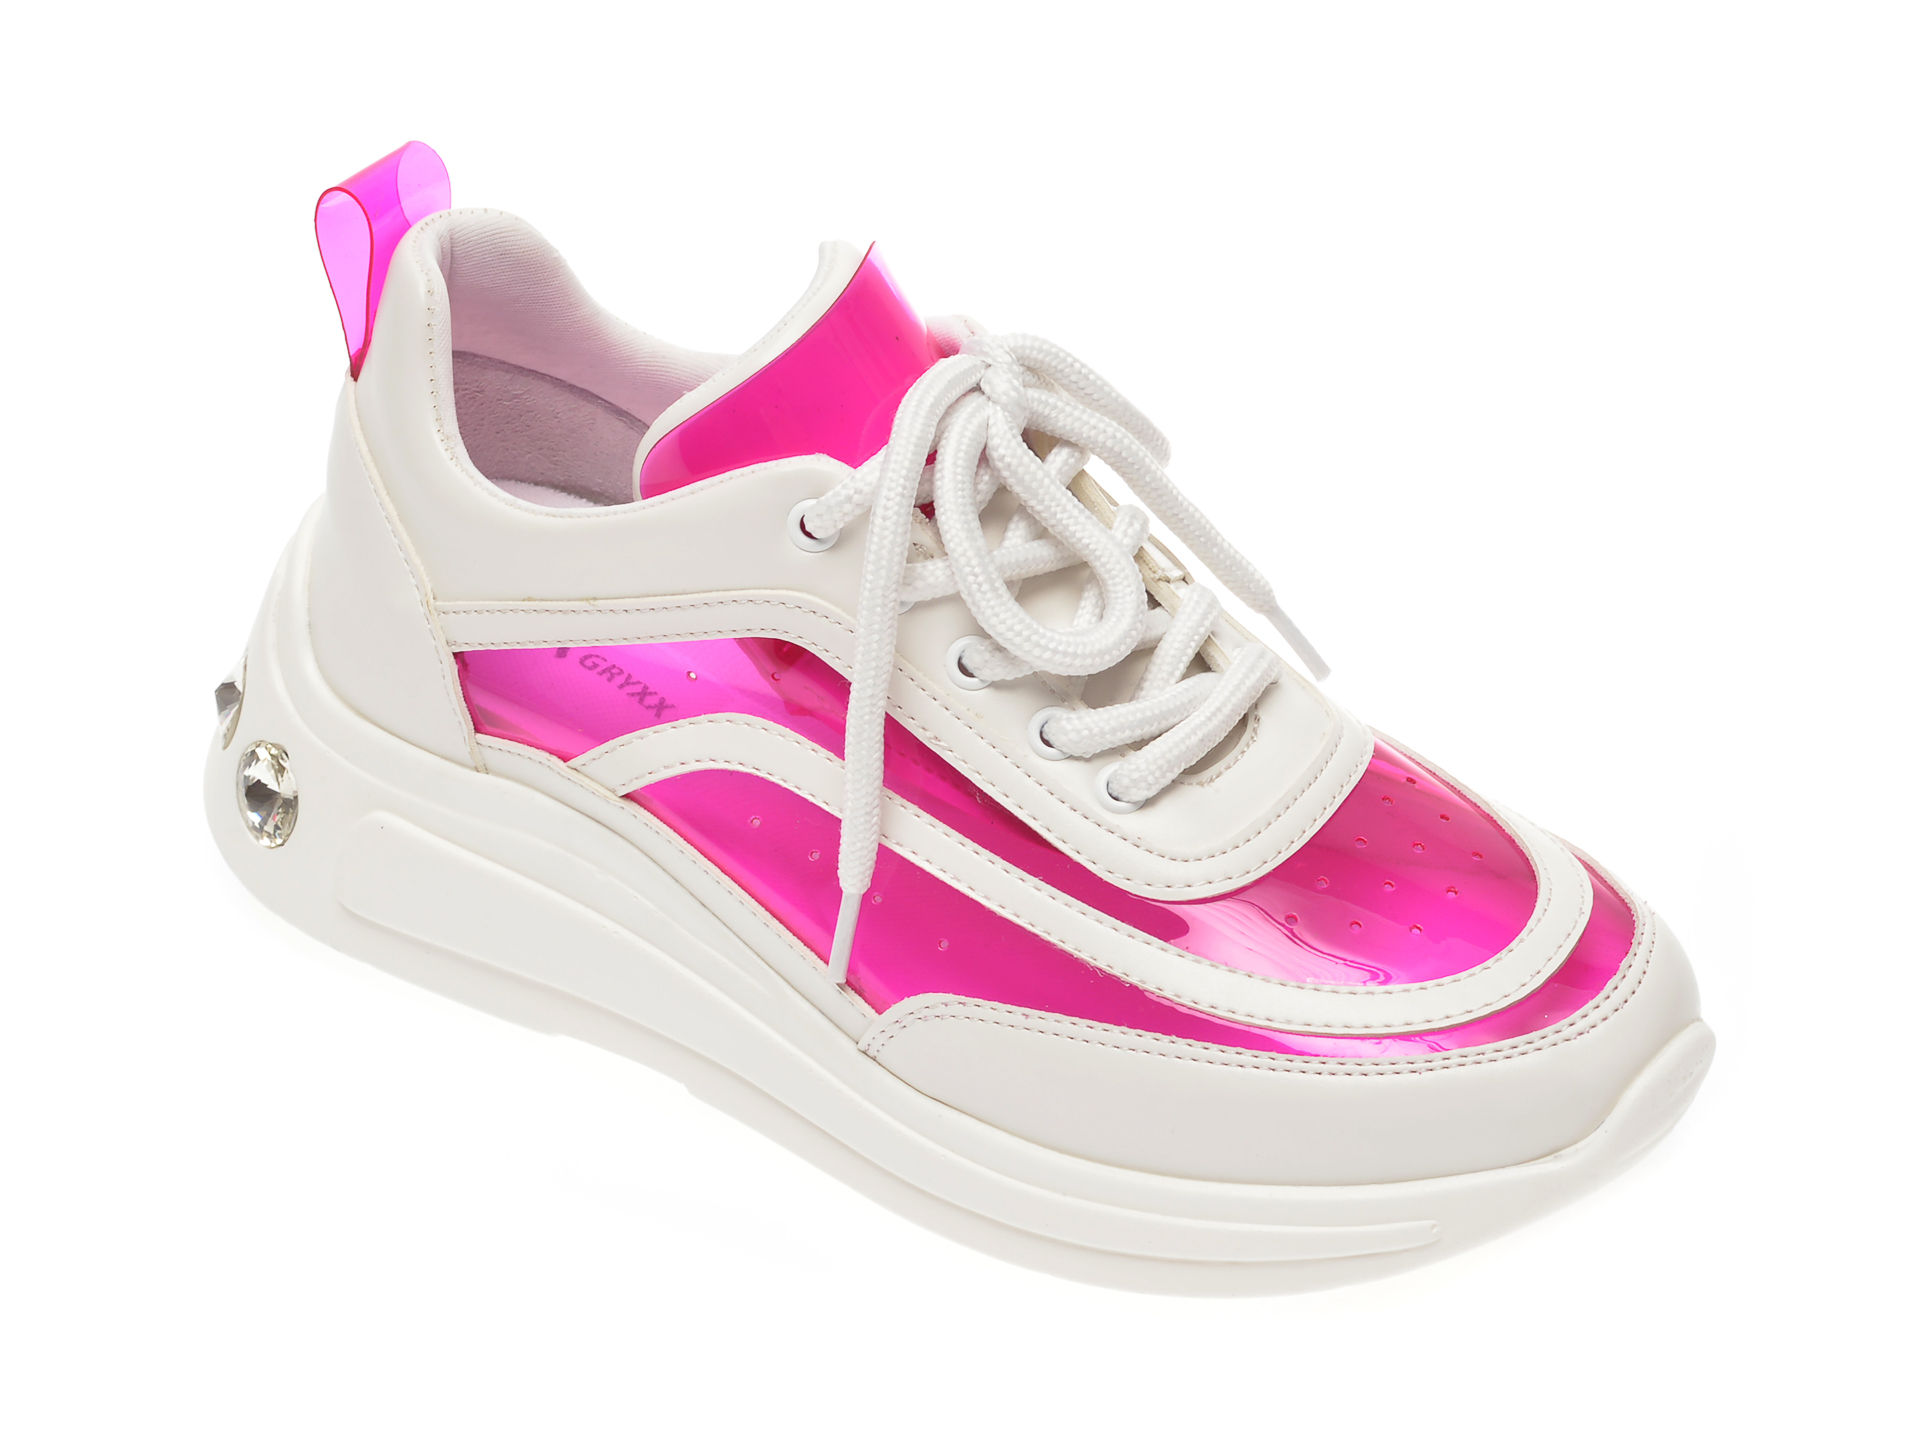 Pantofi sport GRYXX albi, P413, din piele ecologica